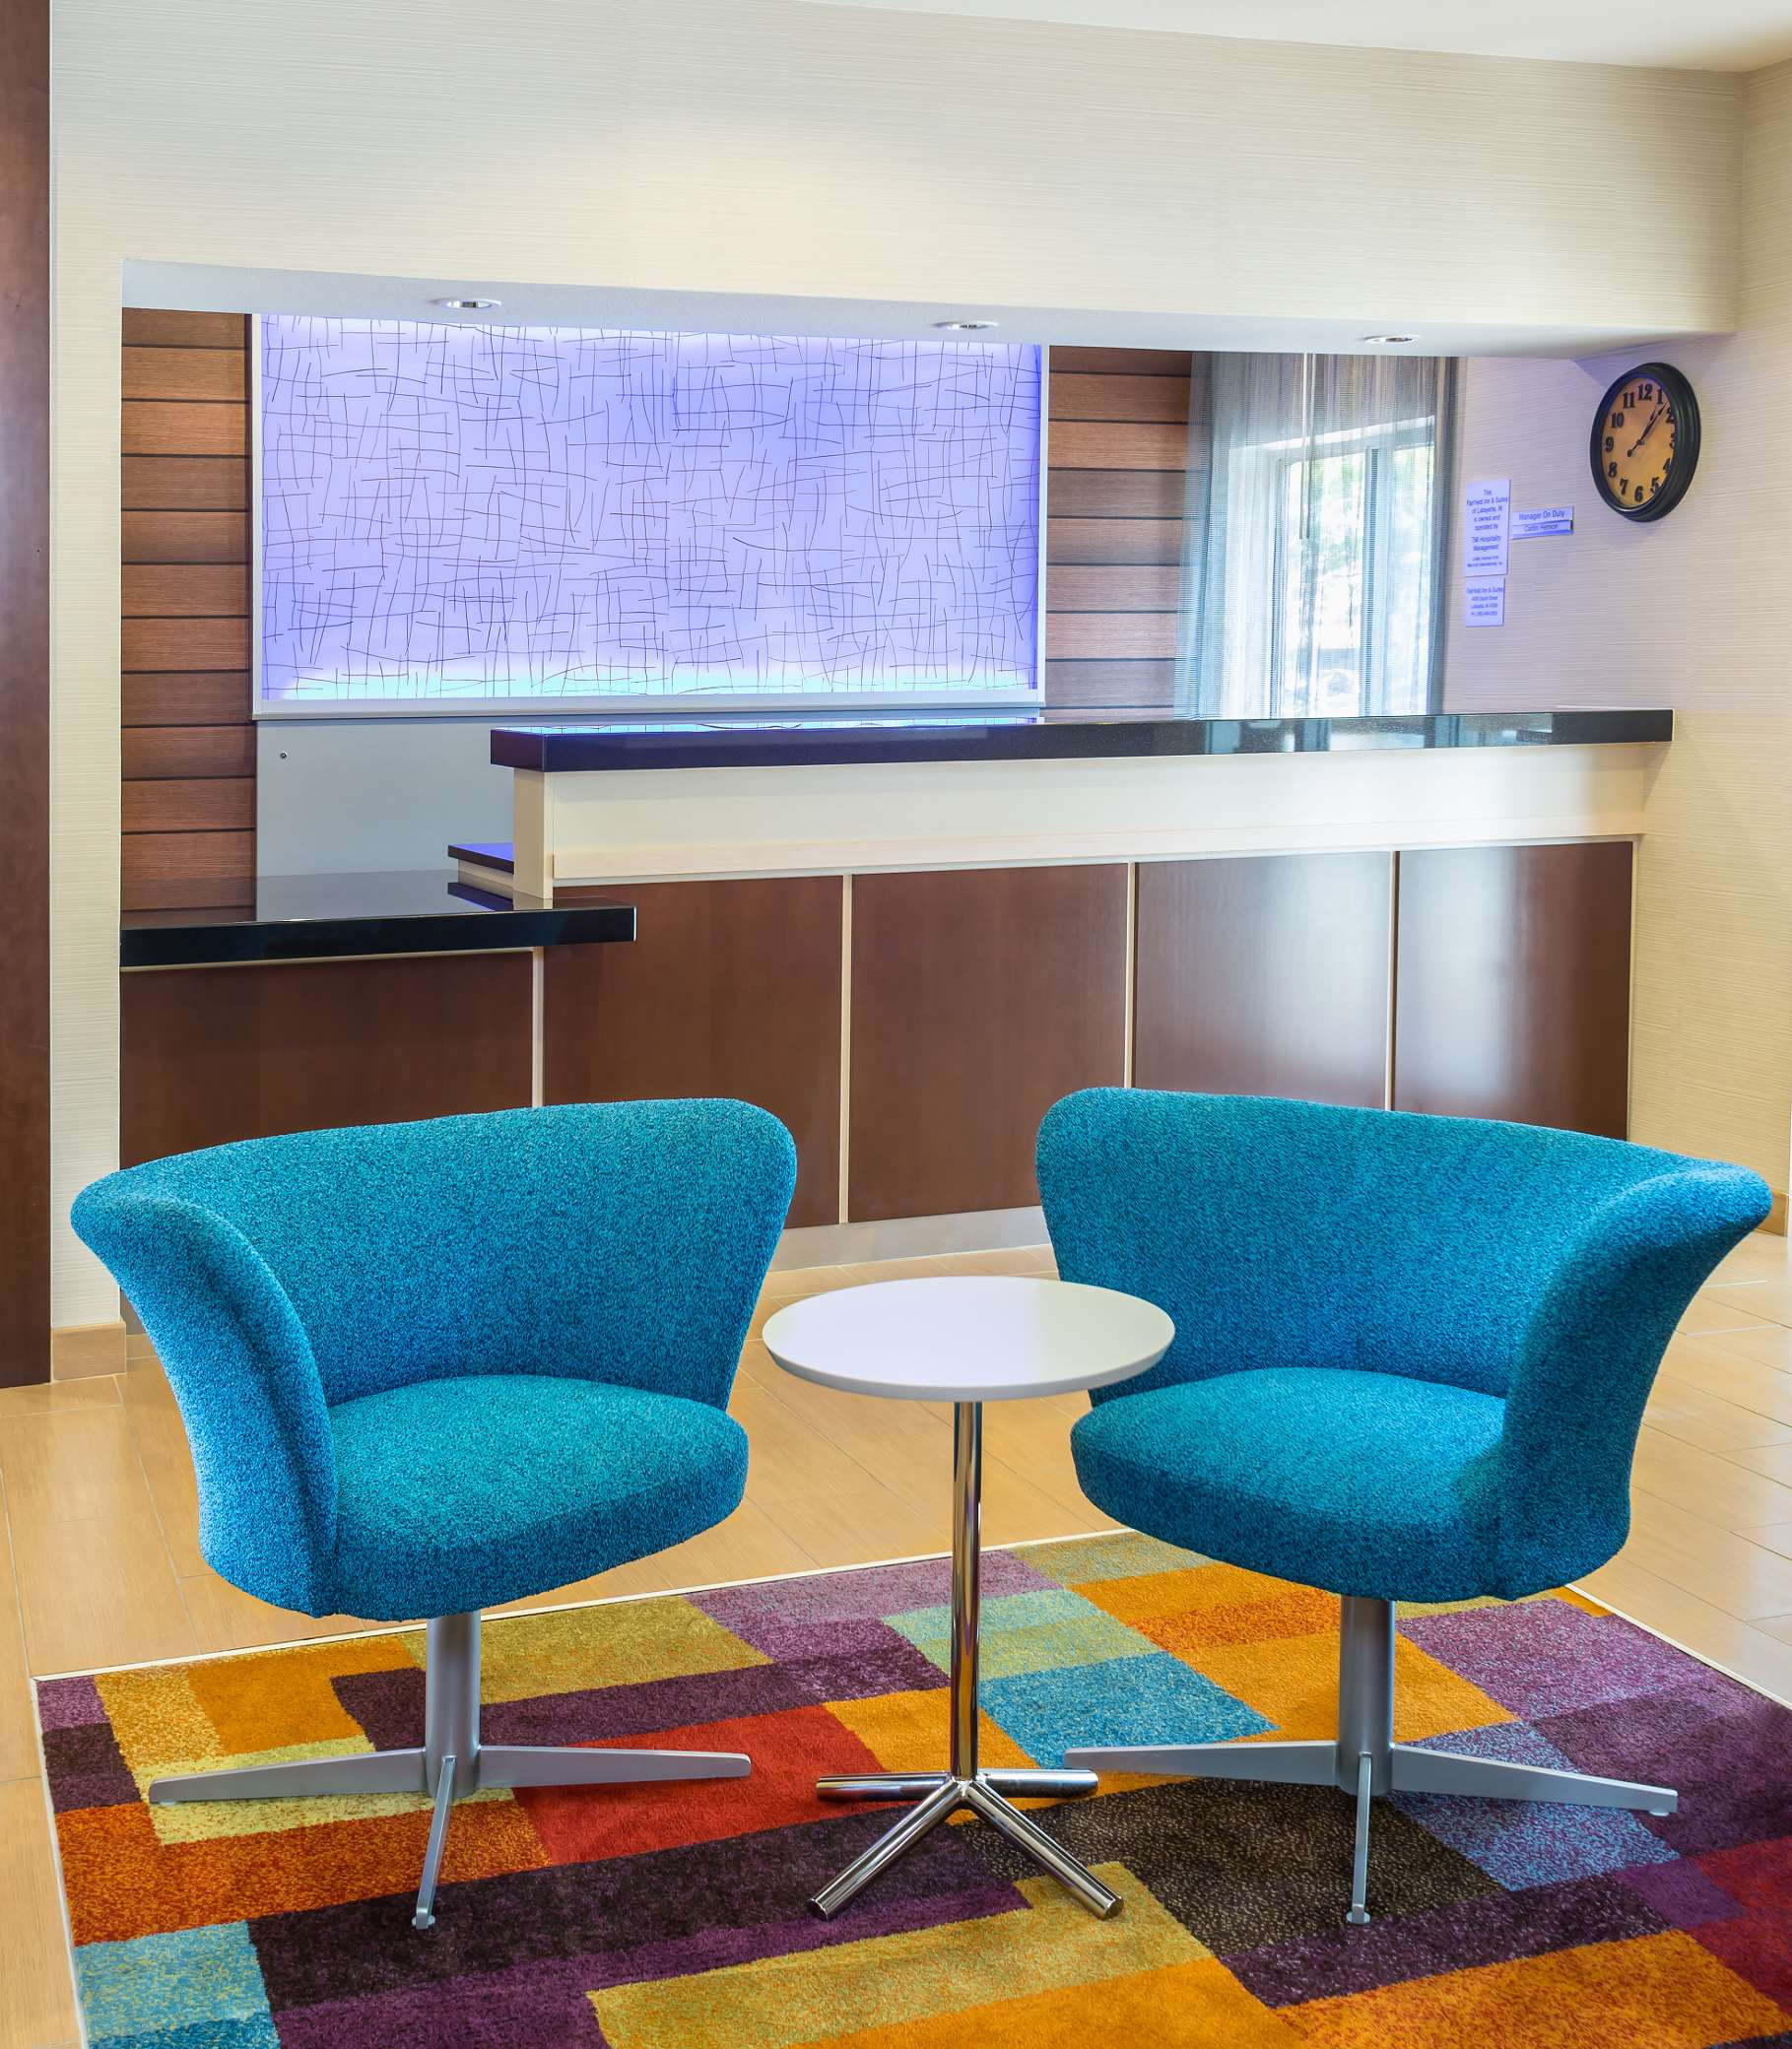 Fairfield Inn & Suites by Marriott Lafayette image 10